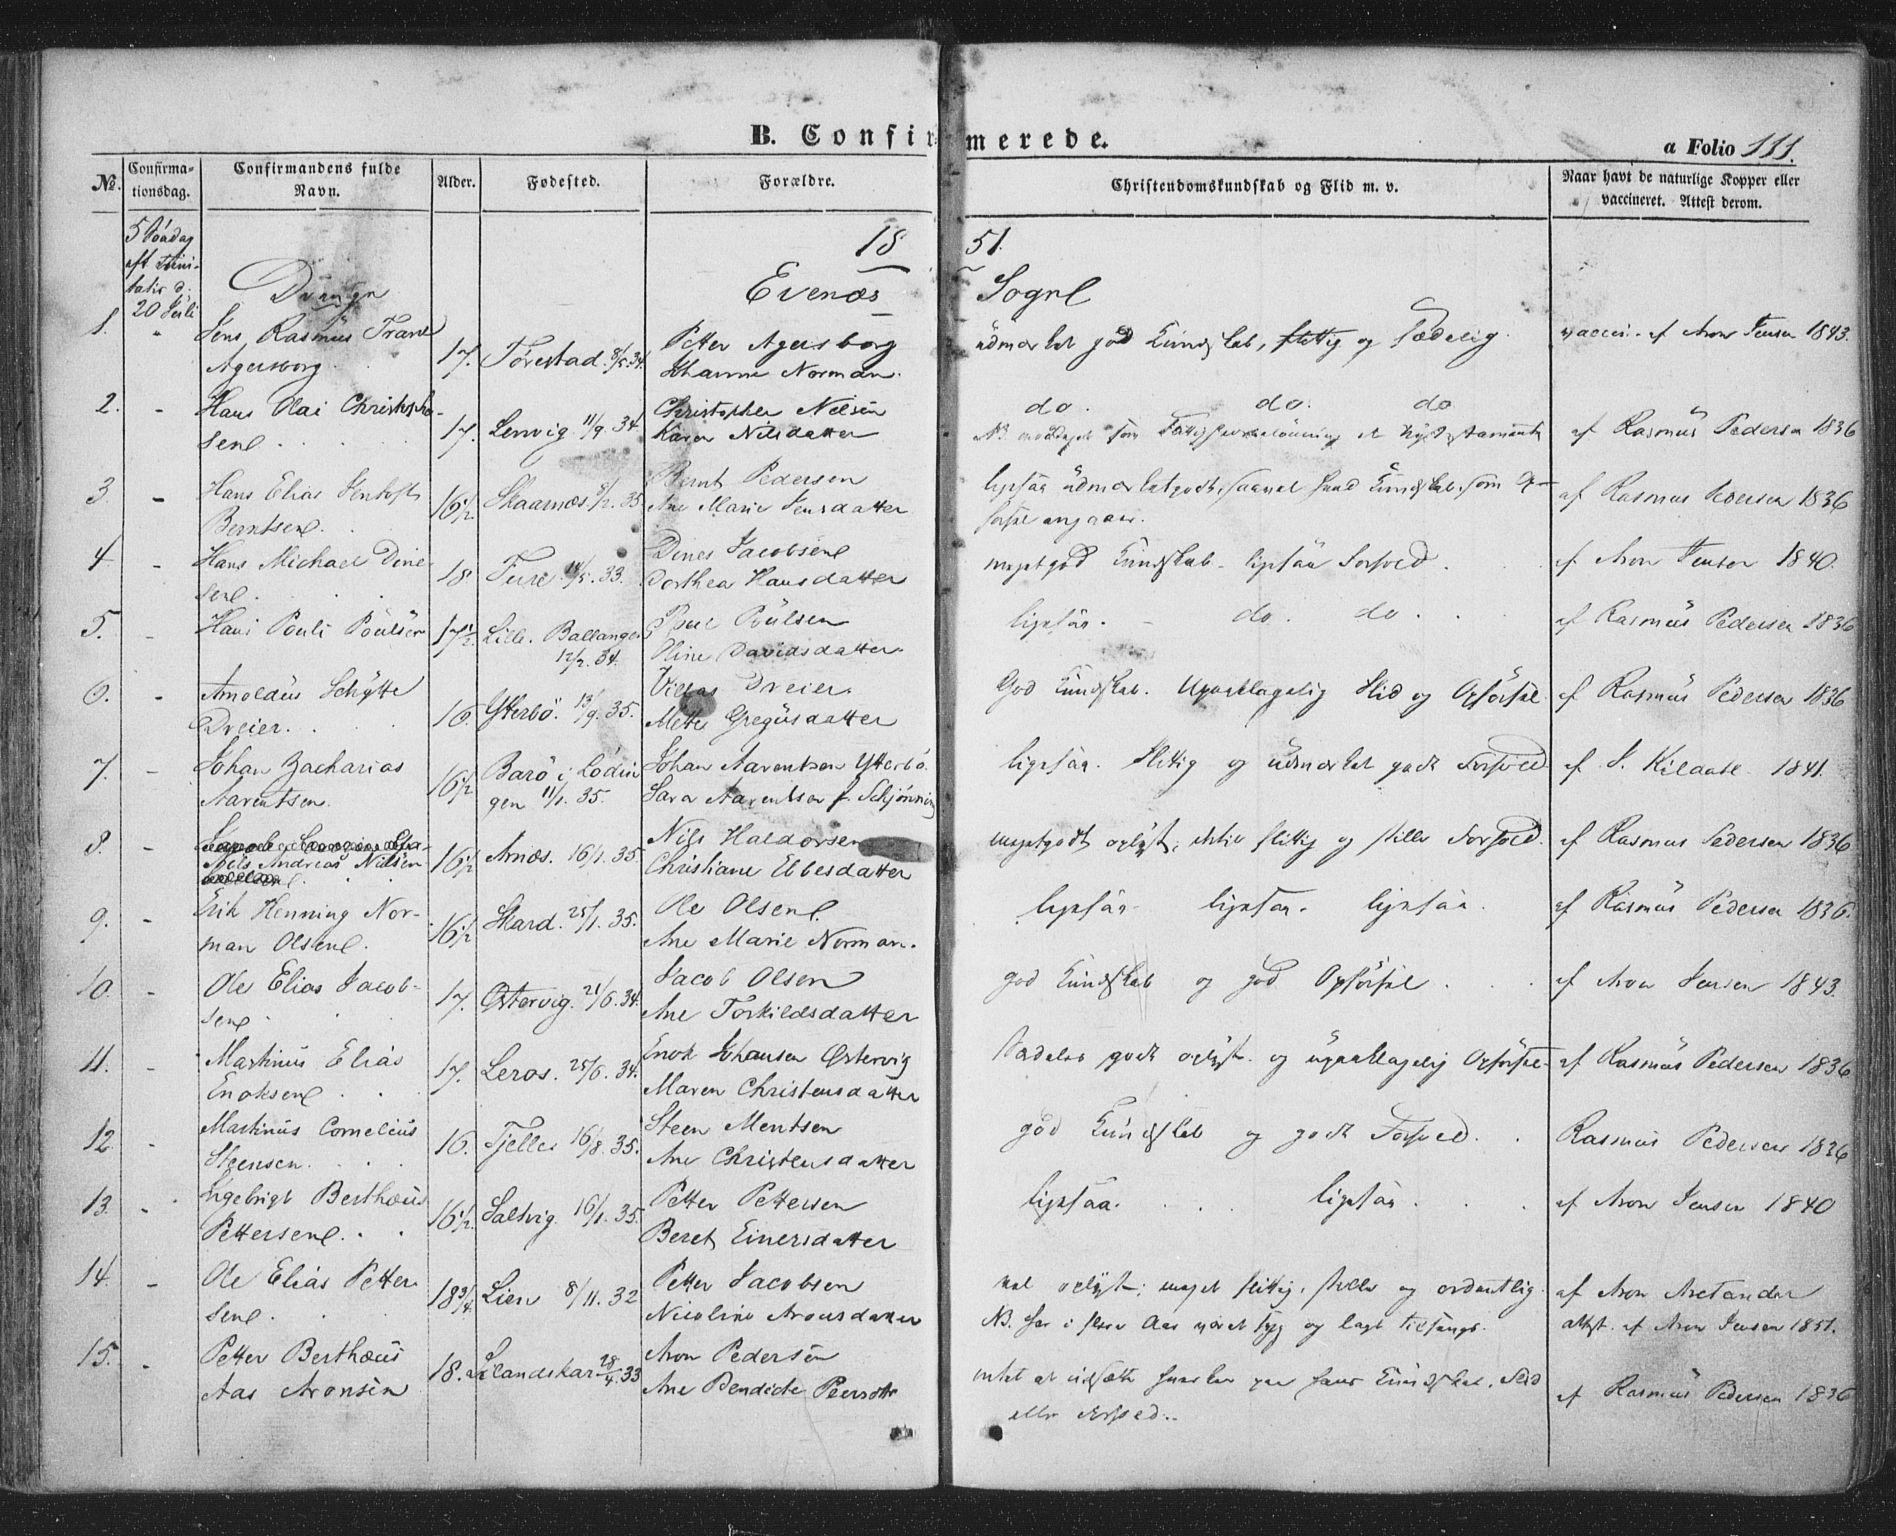 SAT, Ministerialprotokoller, klokkerbøker og fødselsregistre - Nordland, 863/L0895: Ministerialbok nr. 863A07, 1851-1860, s. 111